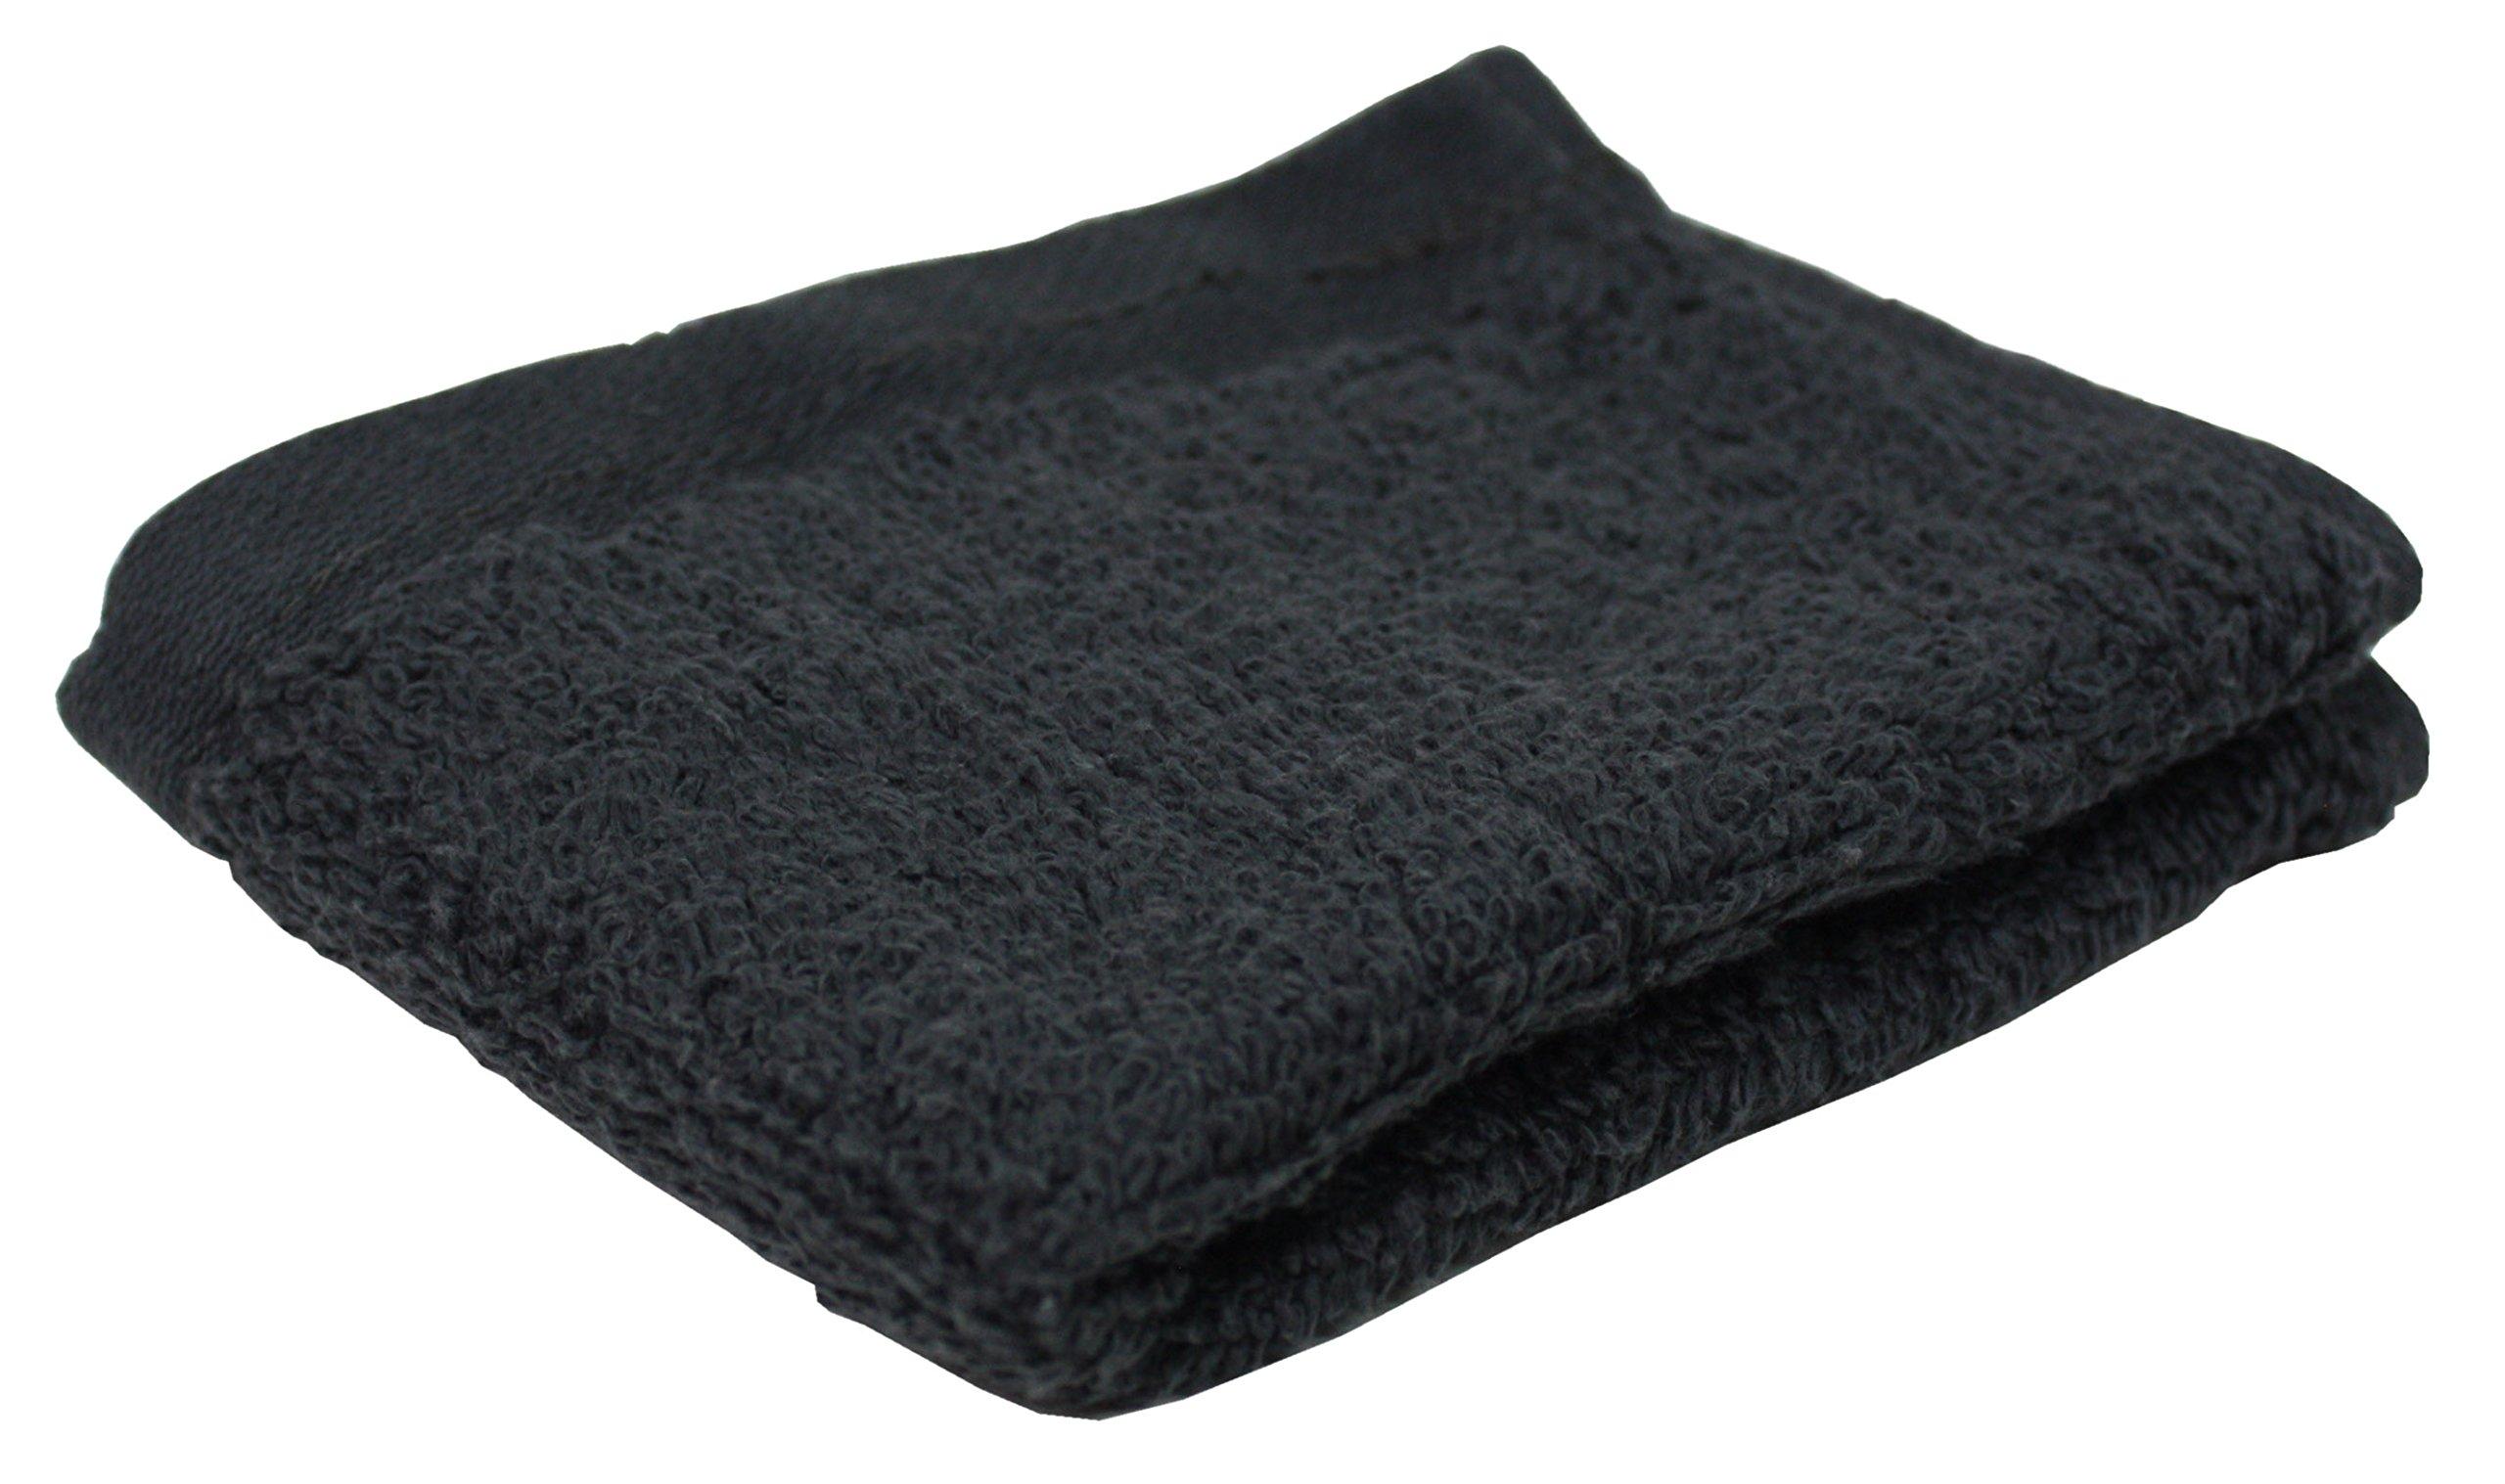 J & M Home Fashions Portofino Washcloth (144 Pack), Dark Gray